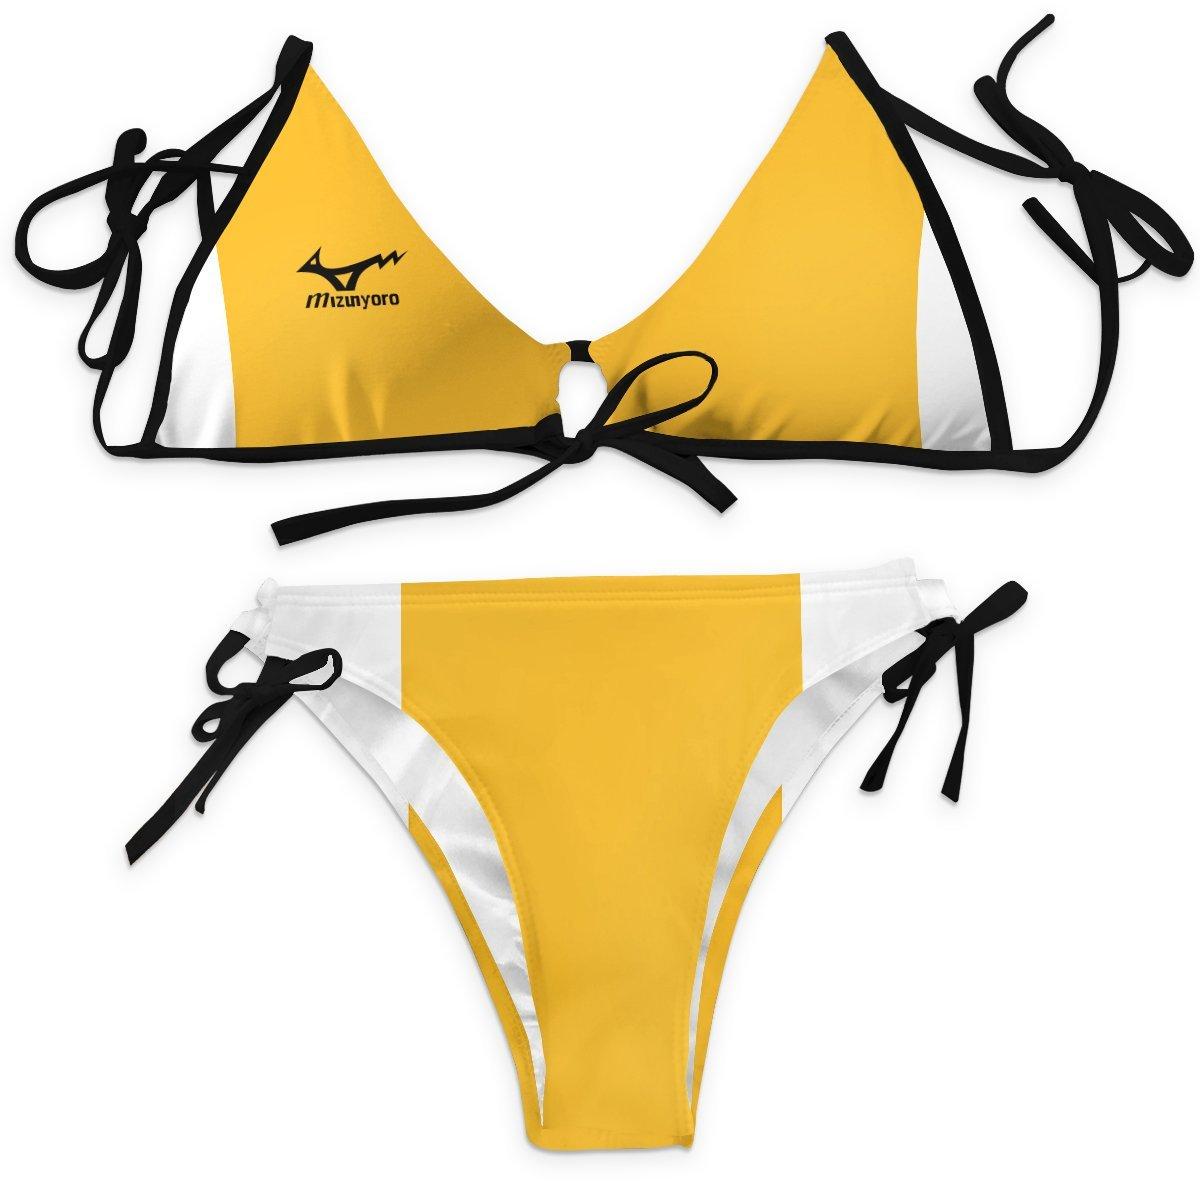 Team Johzenji Bikini Swimsuit FDM3107 XXS Official Anime Swimsuit Merch